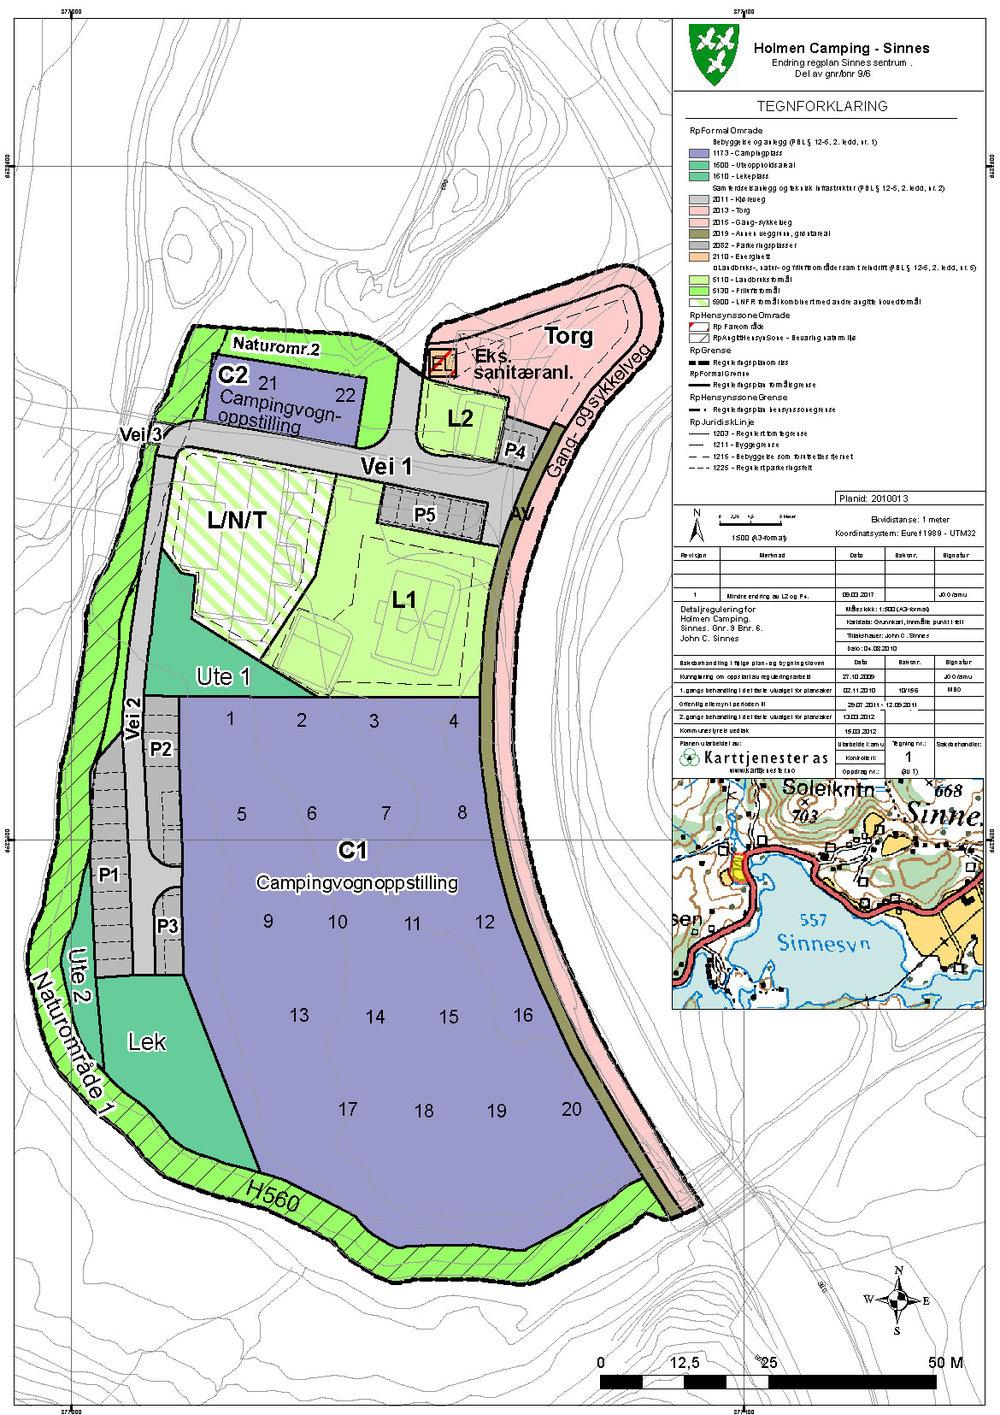 Reguleringsplan for Holmen Camping, Sirdal kommune